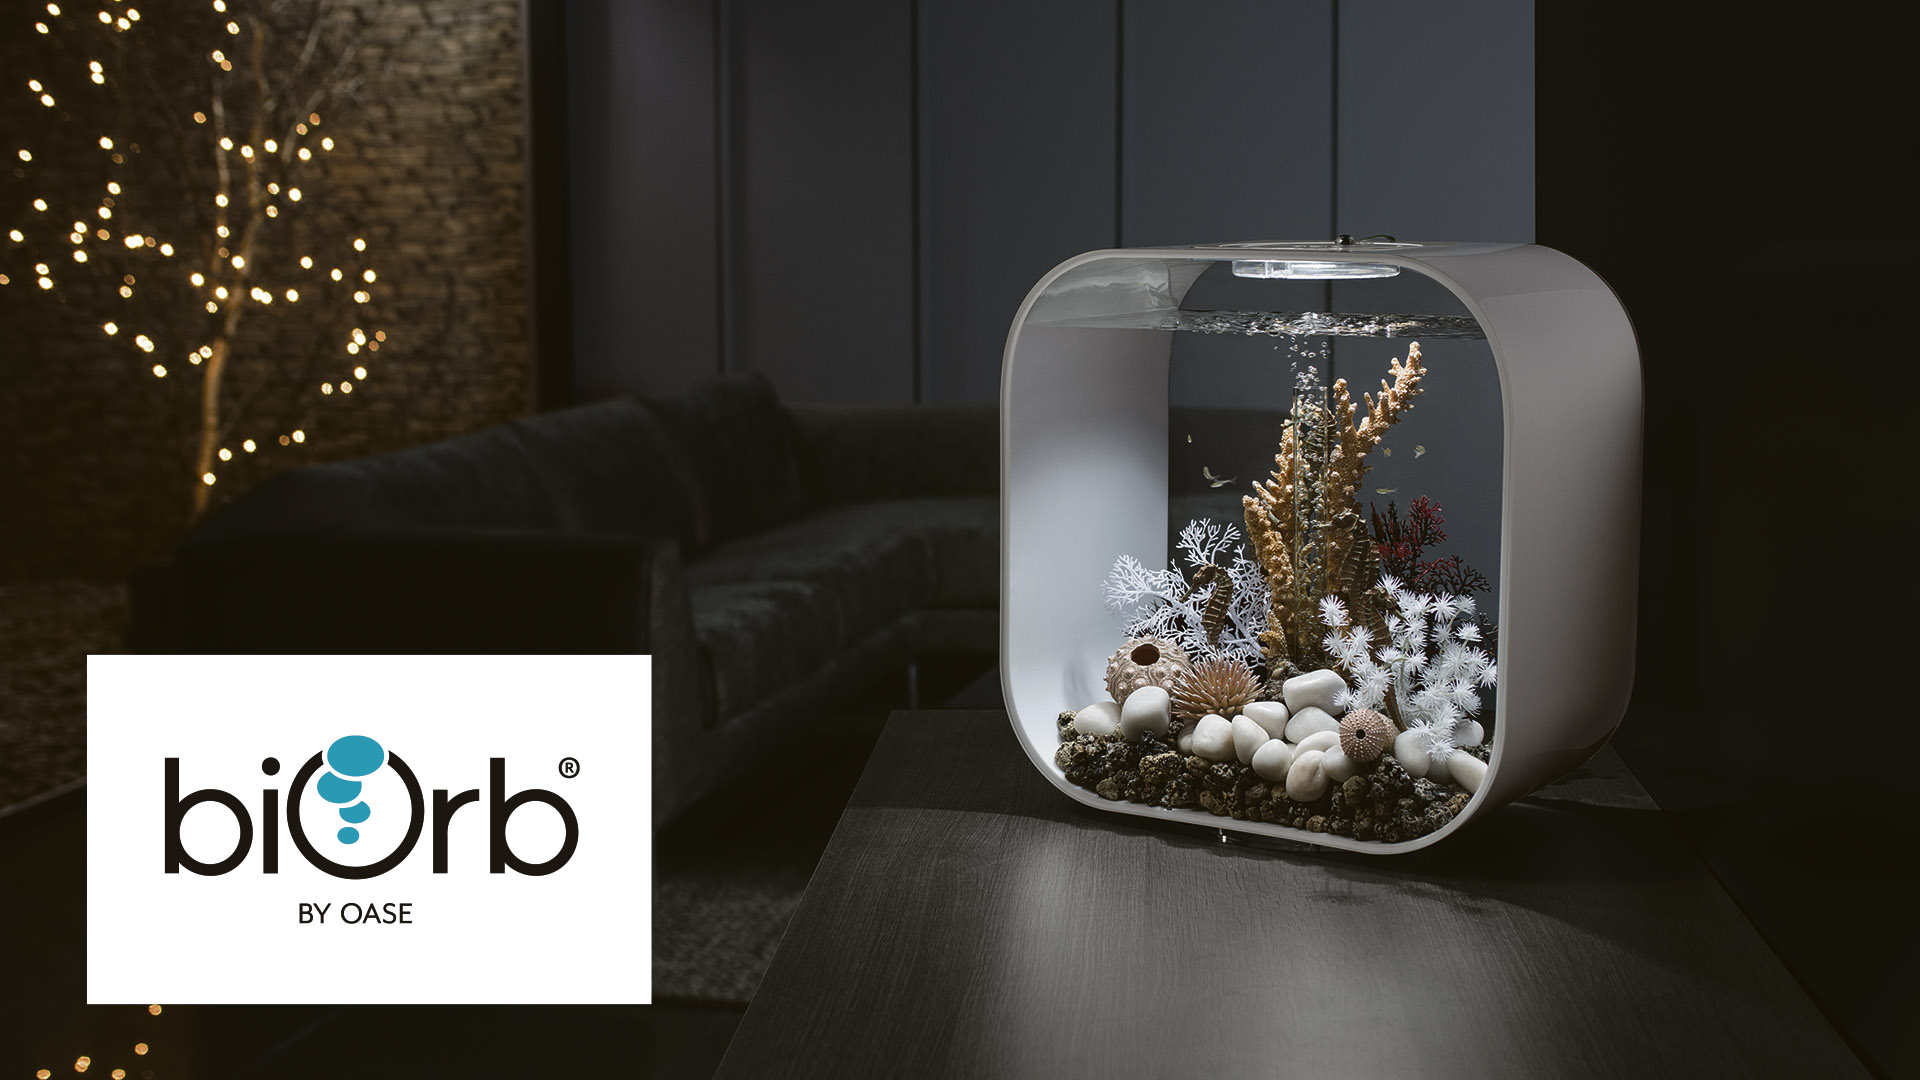 Win a 30 litre aquarium from biOrb Worth £200!